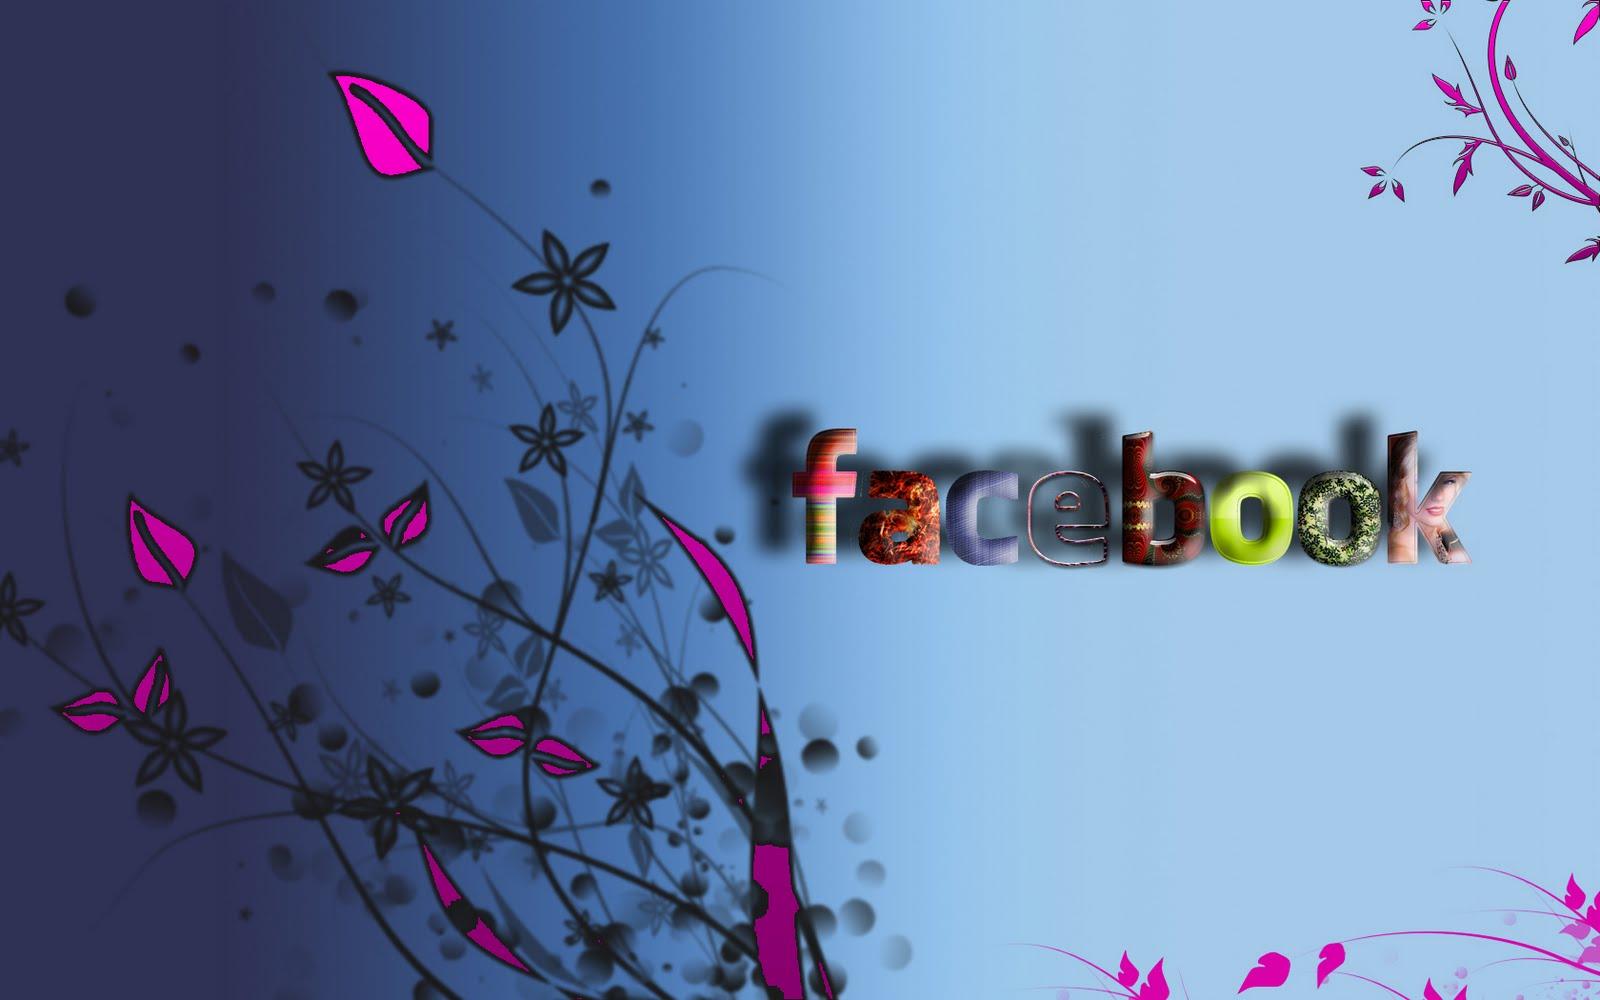 http://4.bp.blogspot.com/-wS3L1mwJzfY/TWV8vvzWkJI/AAAAAAAAA_Q/KRsf96tEcMM/s1600/facebook_wallpaper%2B%25281%2529.jpg